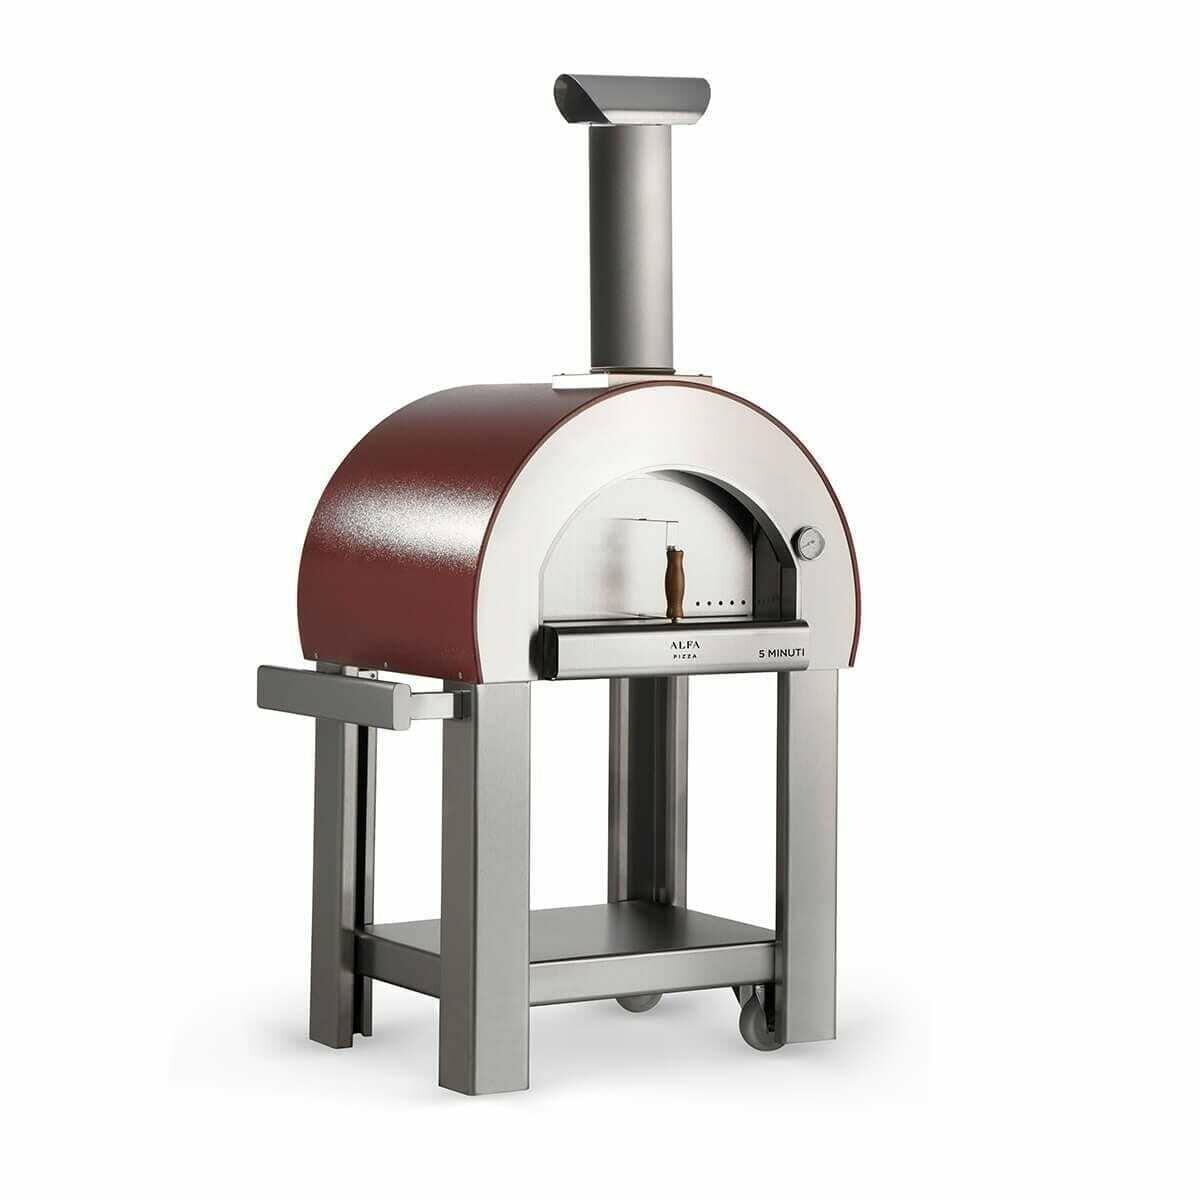 Alfa 5 Minuti Wood Fired Oven with Base